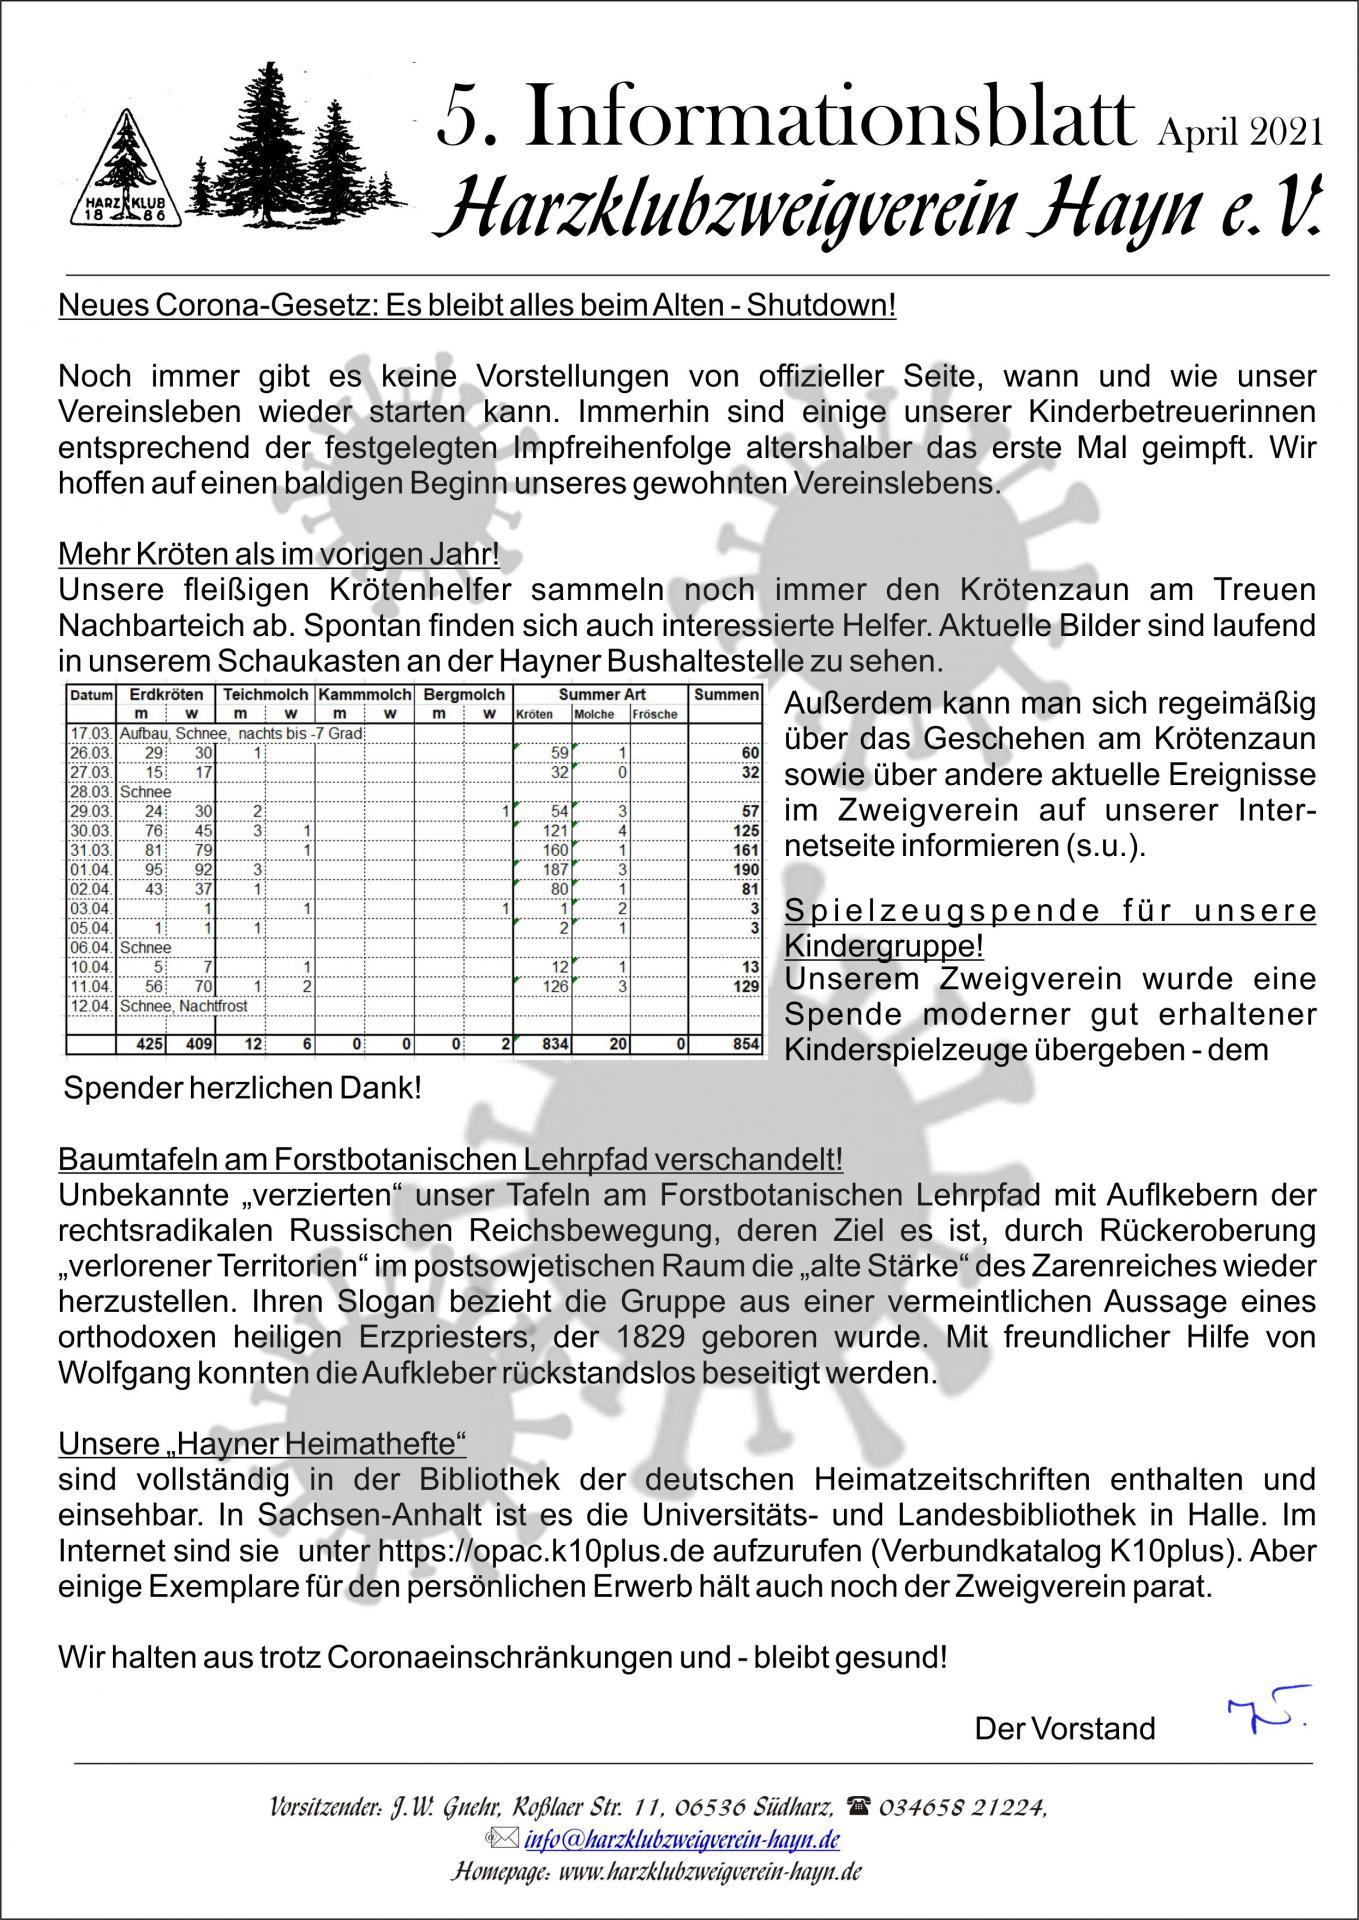 5- Coronainformationsblatt